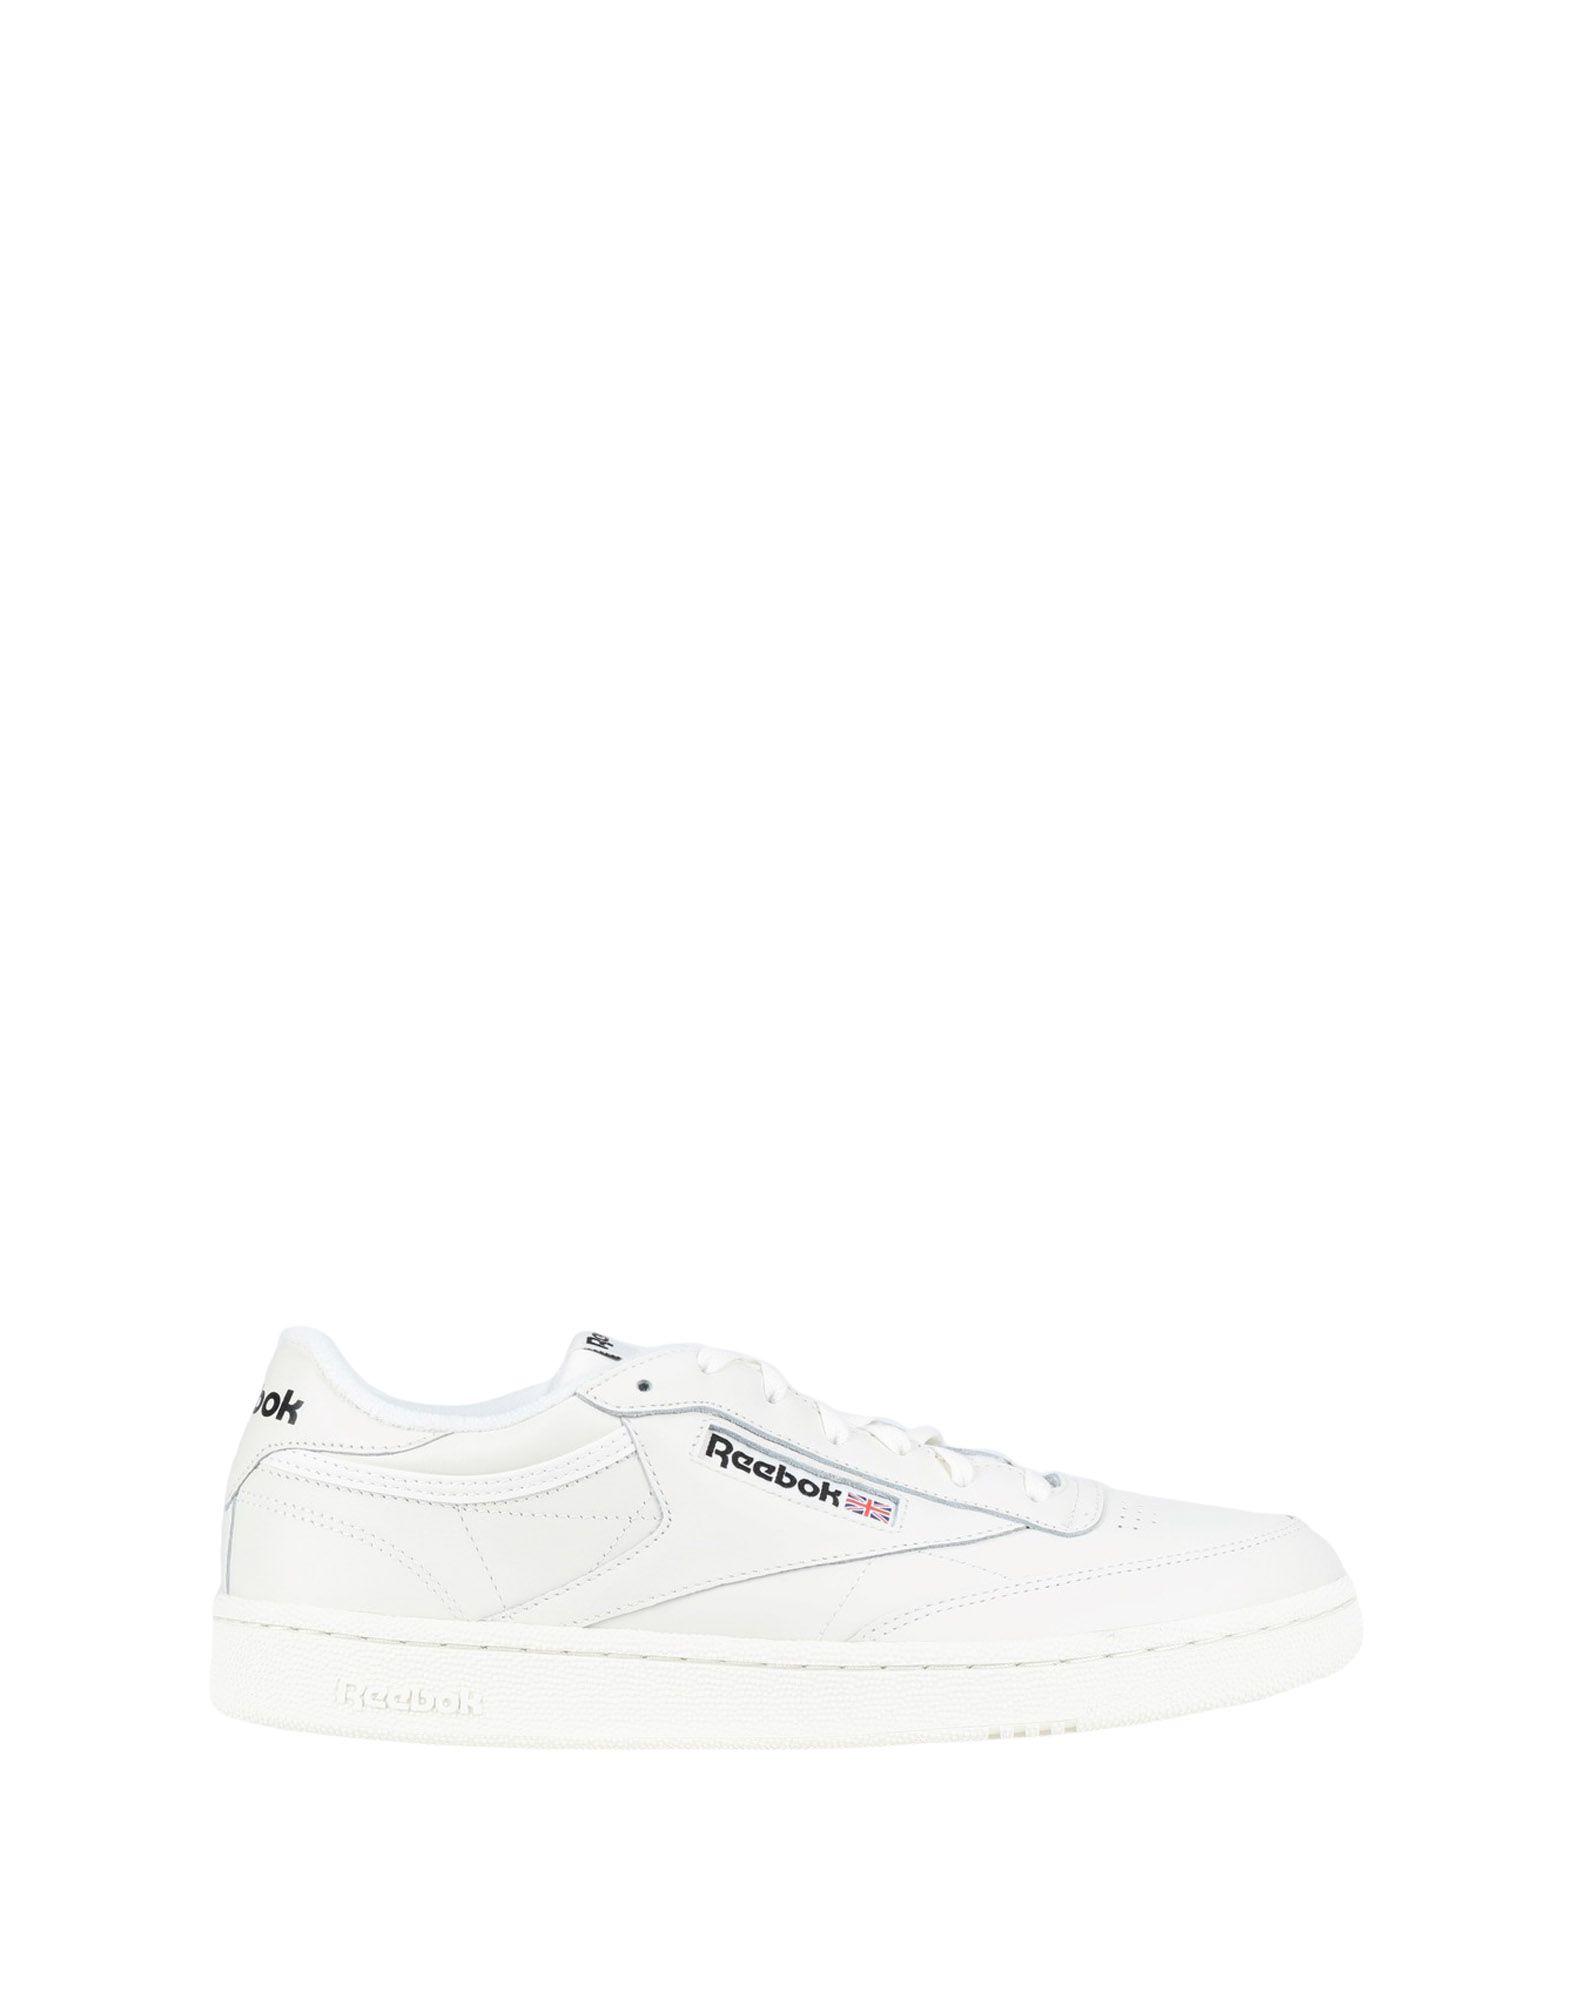 Sneakers Reebok Club C 85 Mu - Uomo - 11538620NV